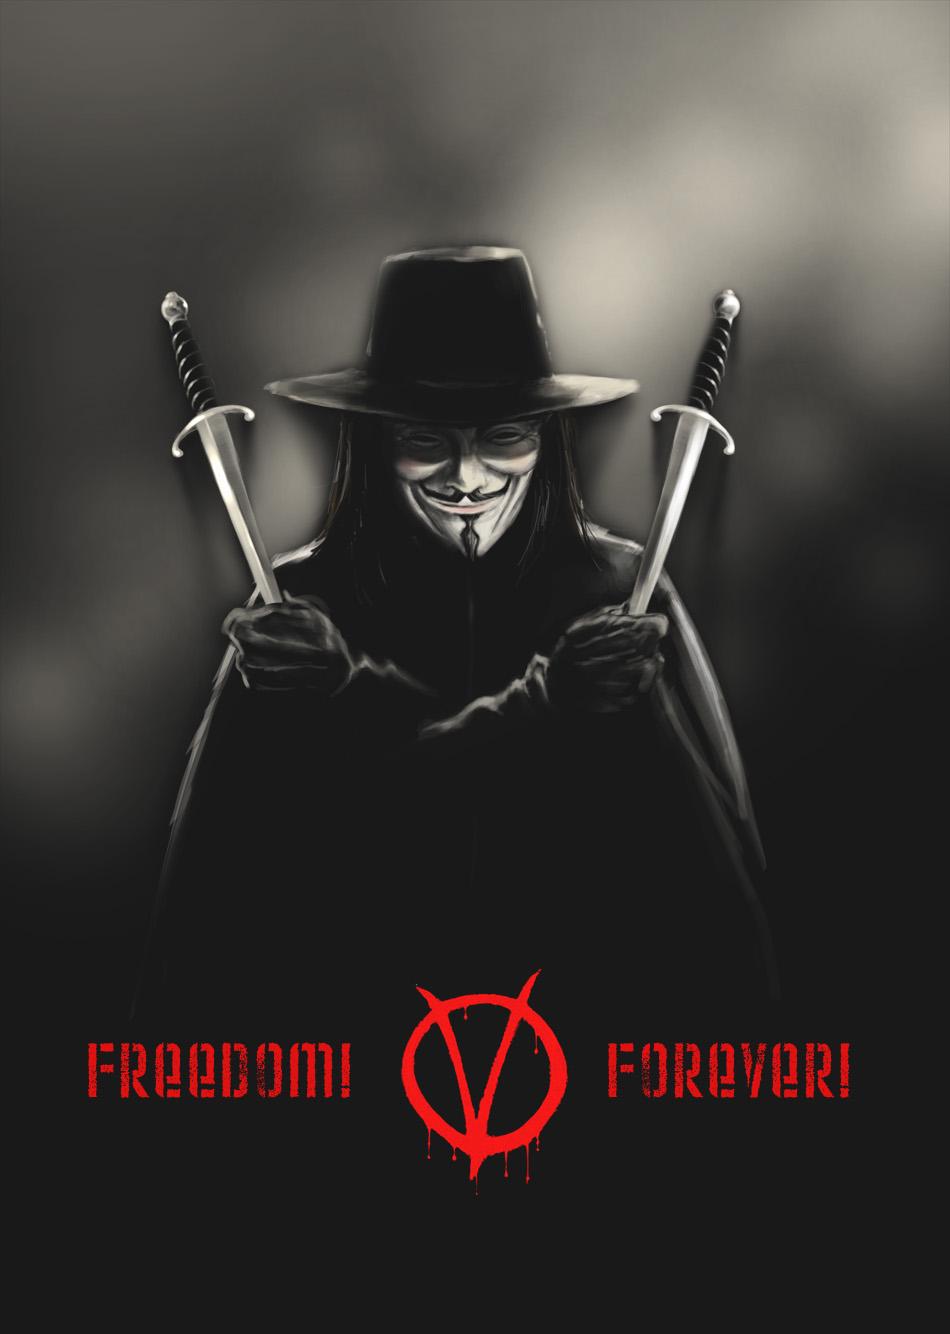 Файл:V for Vendetta by Rub a Duckie.jpg — Суперсилы Вики